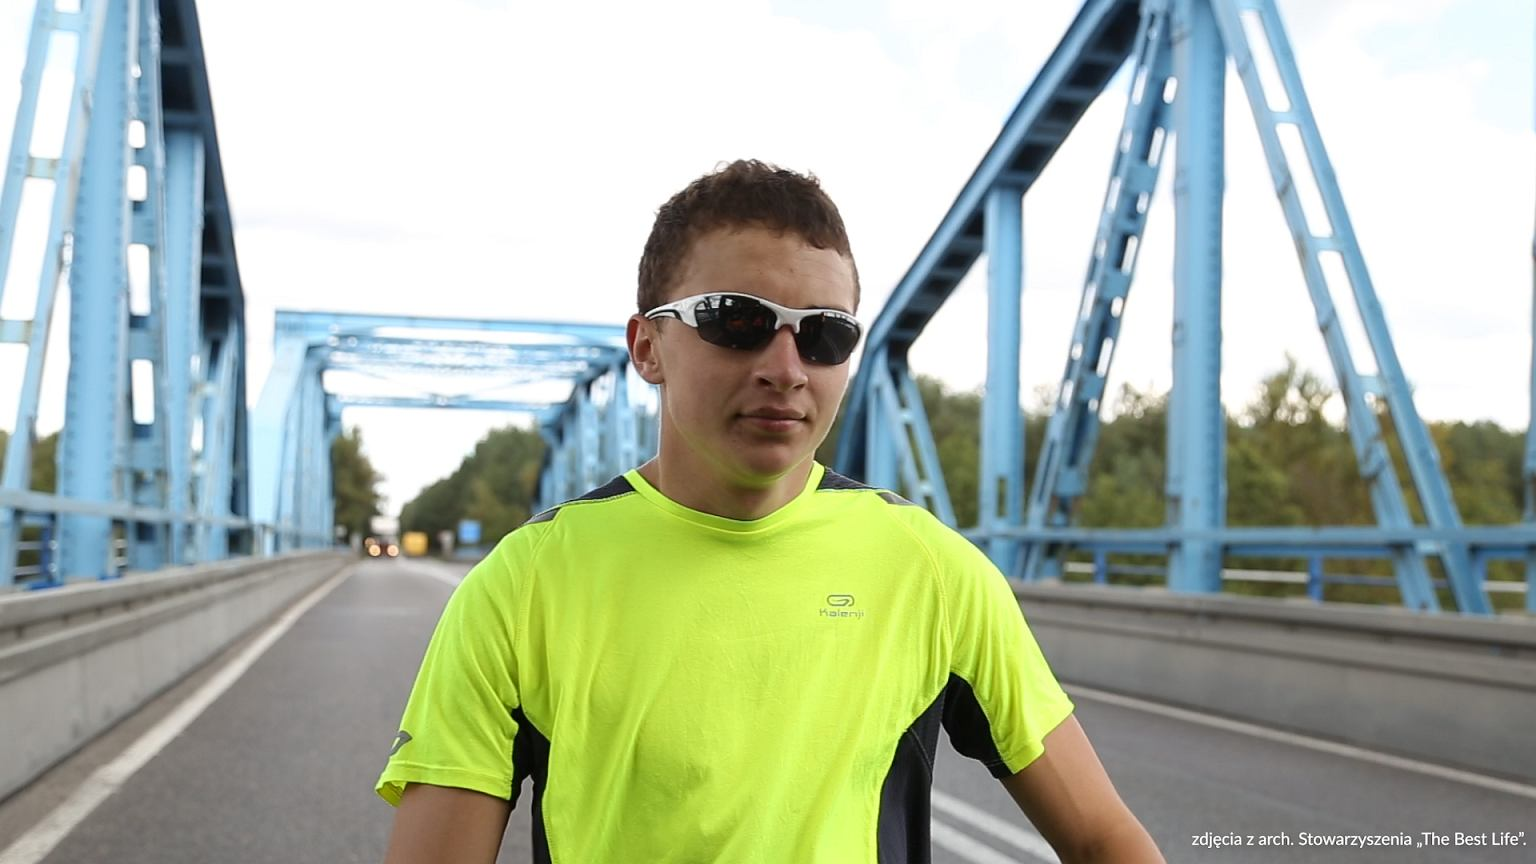 Adrian Beściak